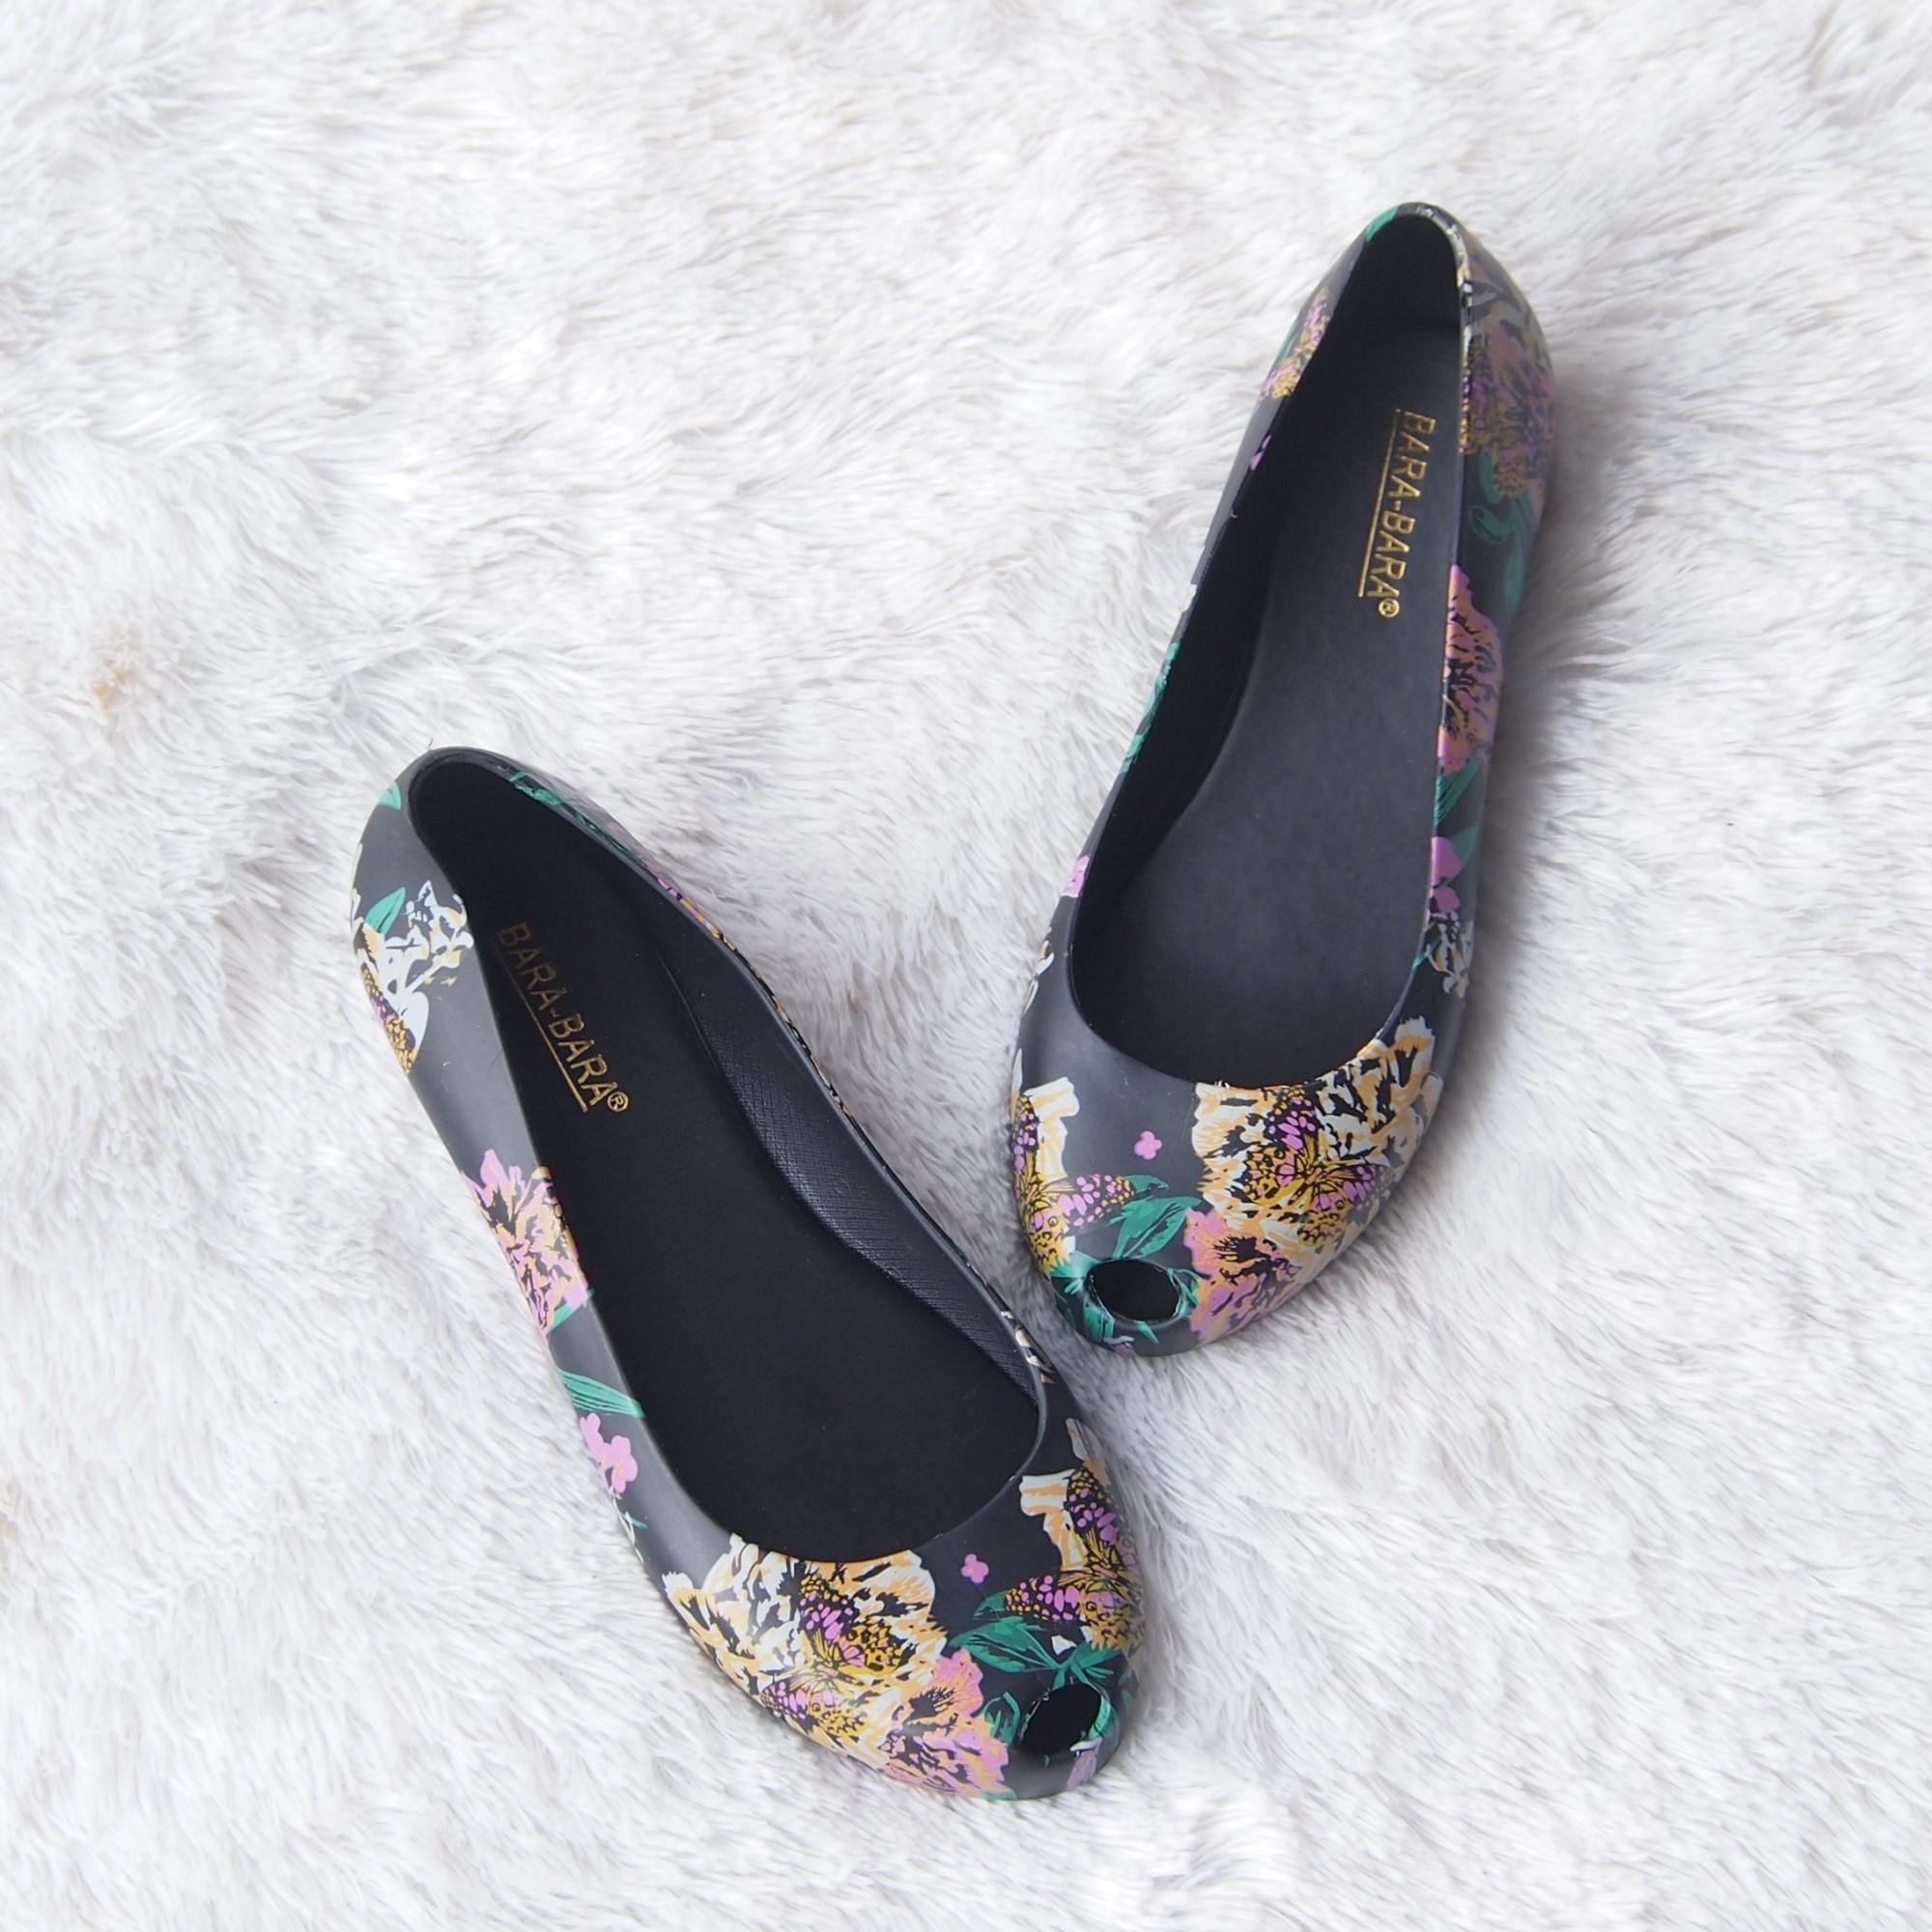 Bara Bara - Flatshoes Jelly Wanita Motif Bunga Terbaru 1838MSB Warna Dikirim Random